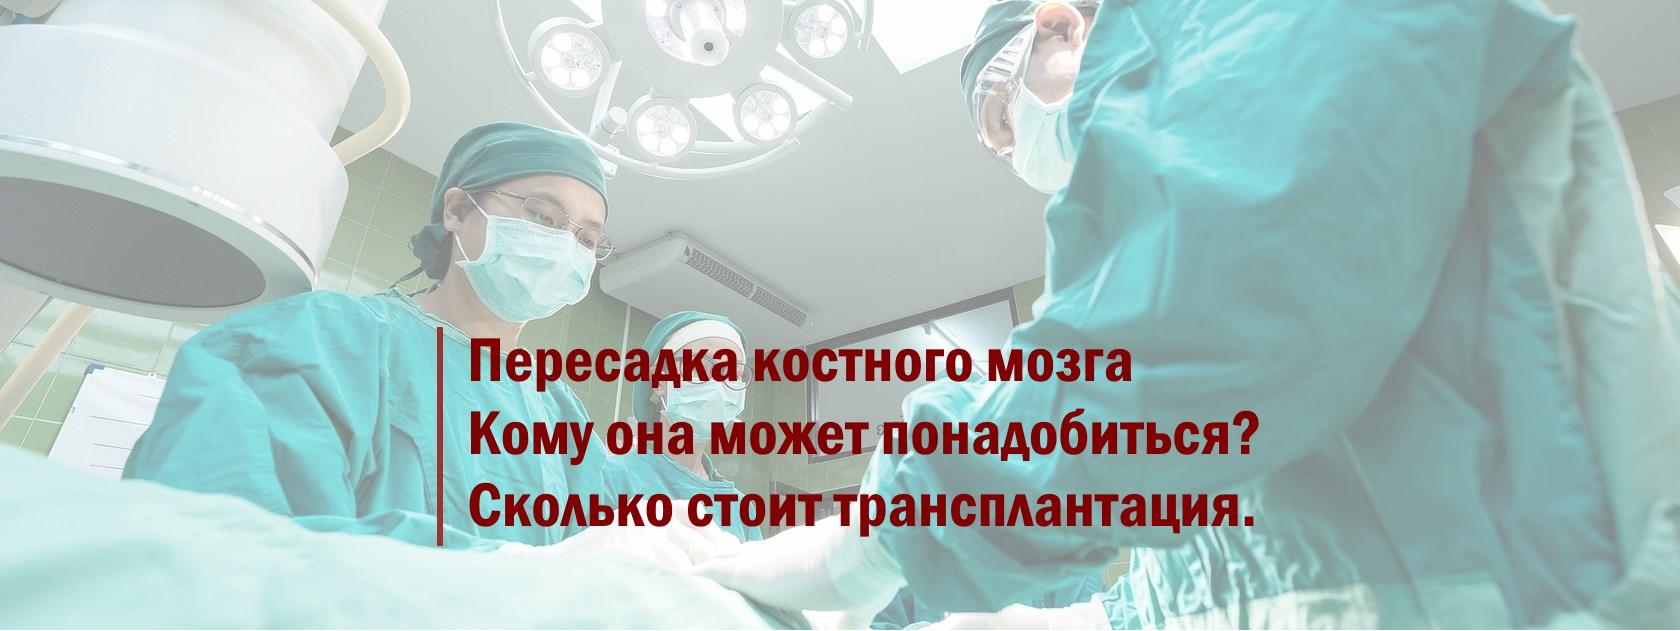 Пересадка костного мозга в рамках полиса ММС